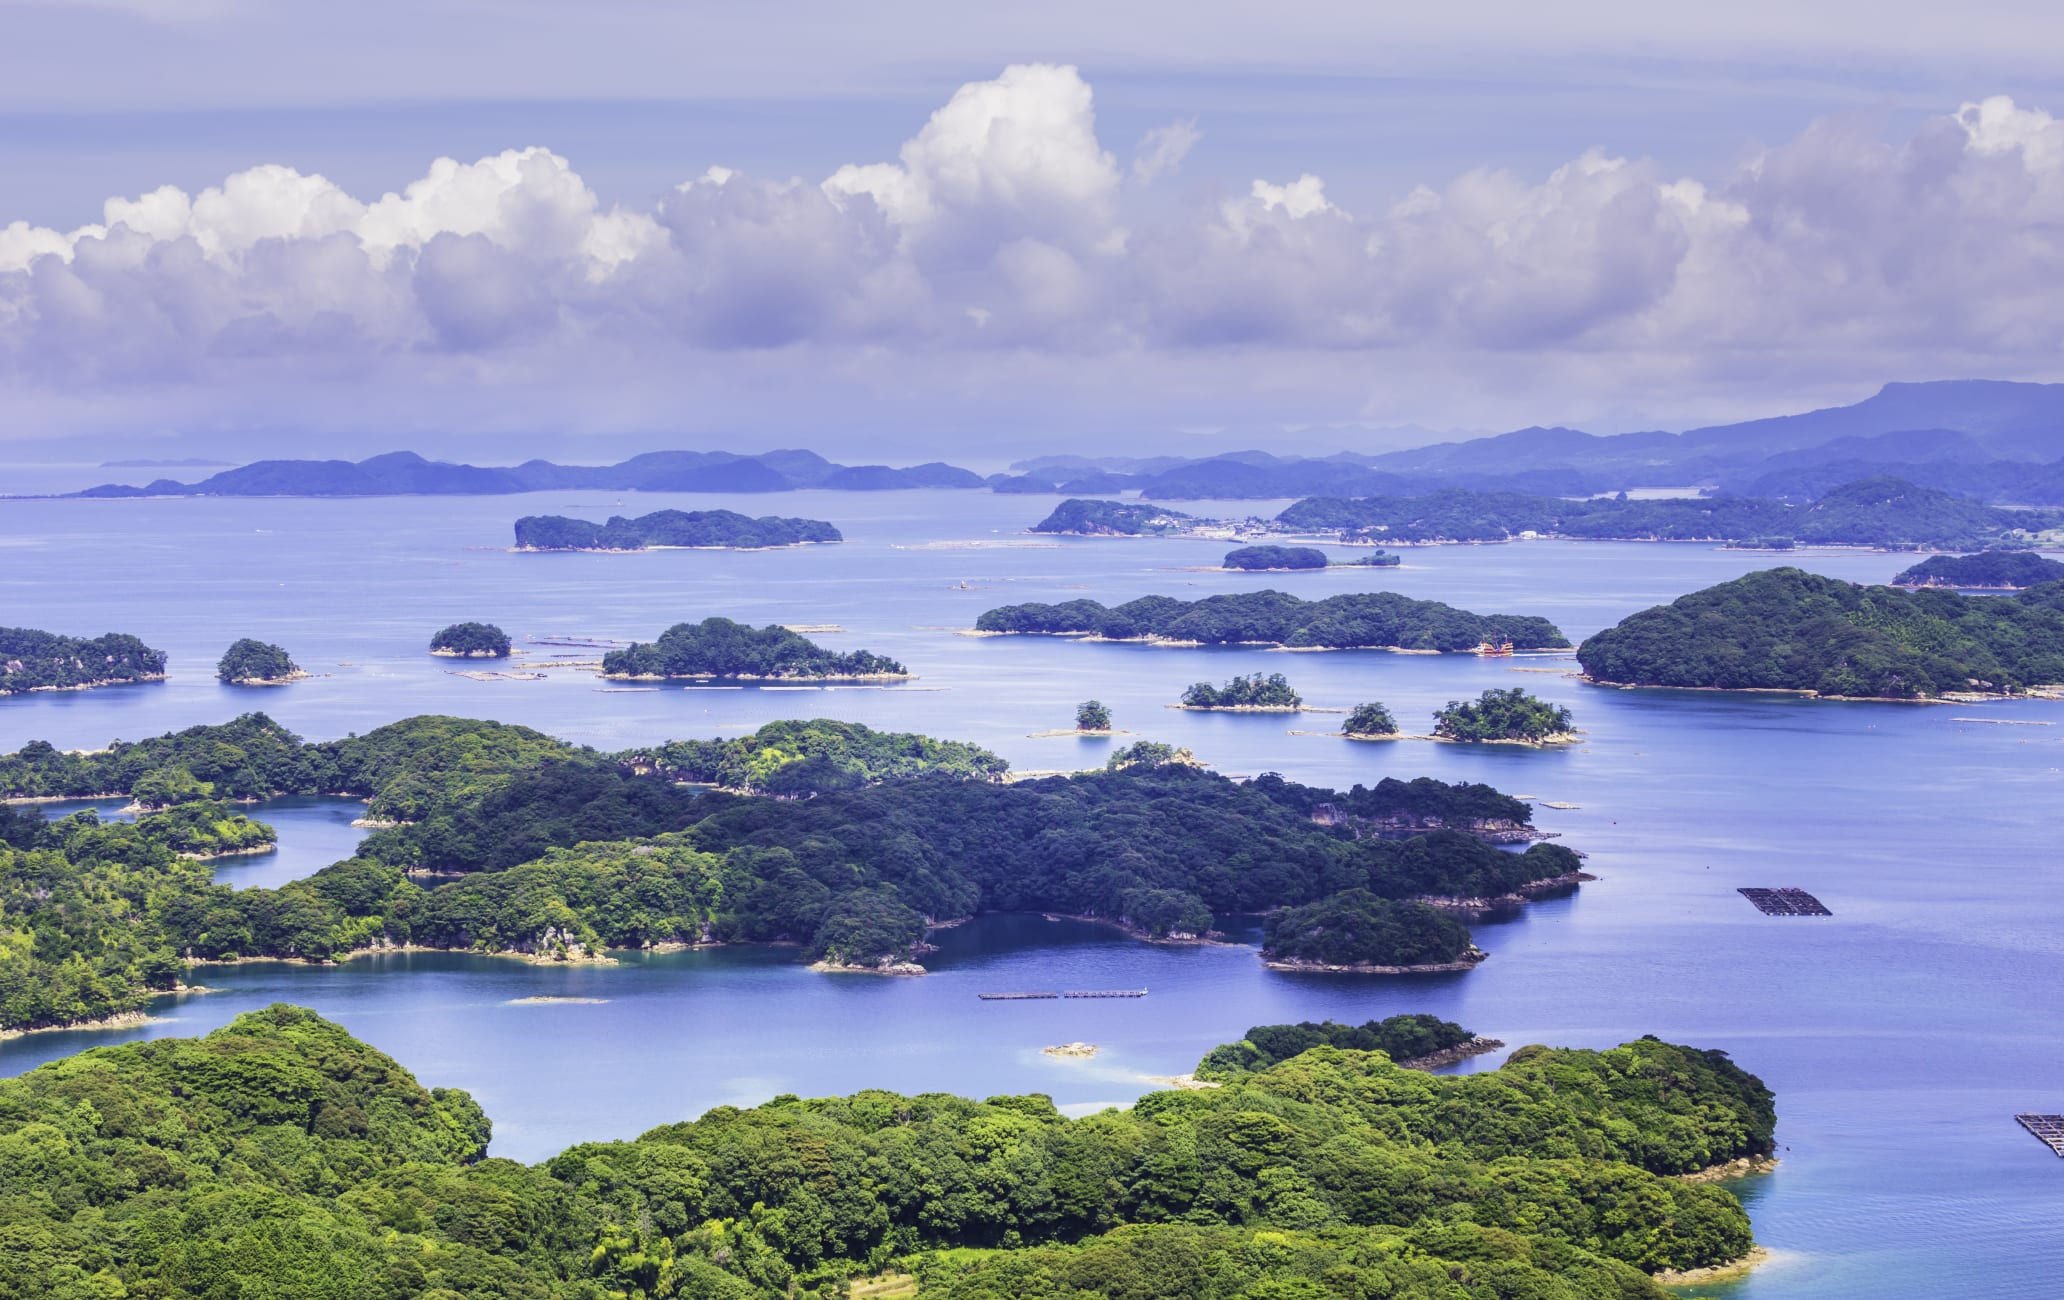 Kujuku-shima Islands